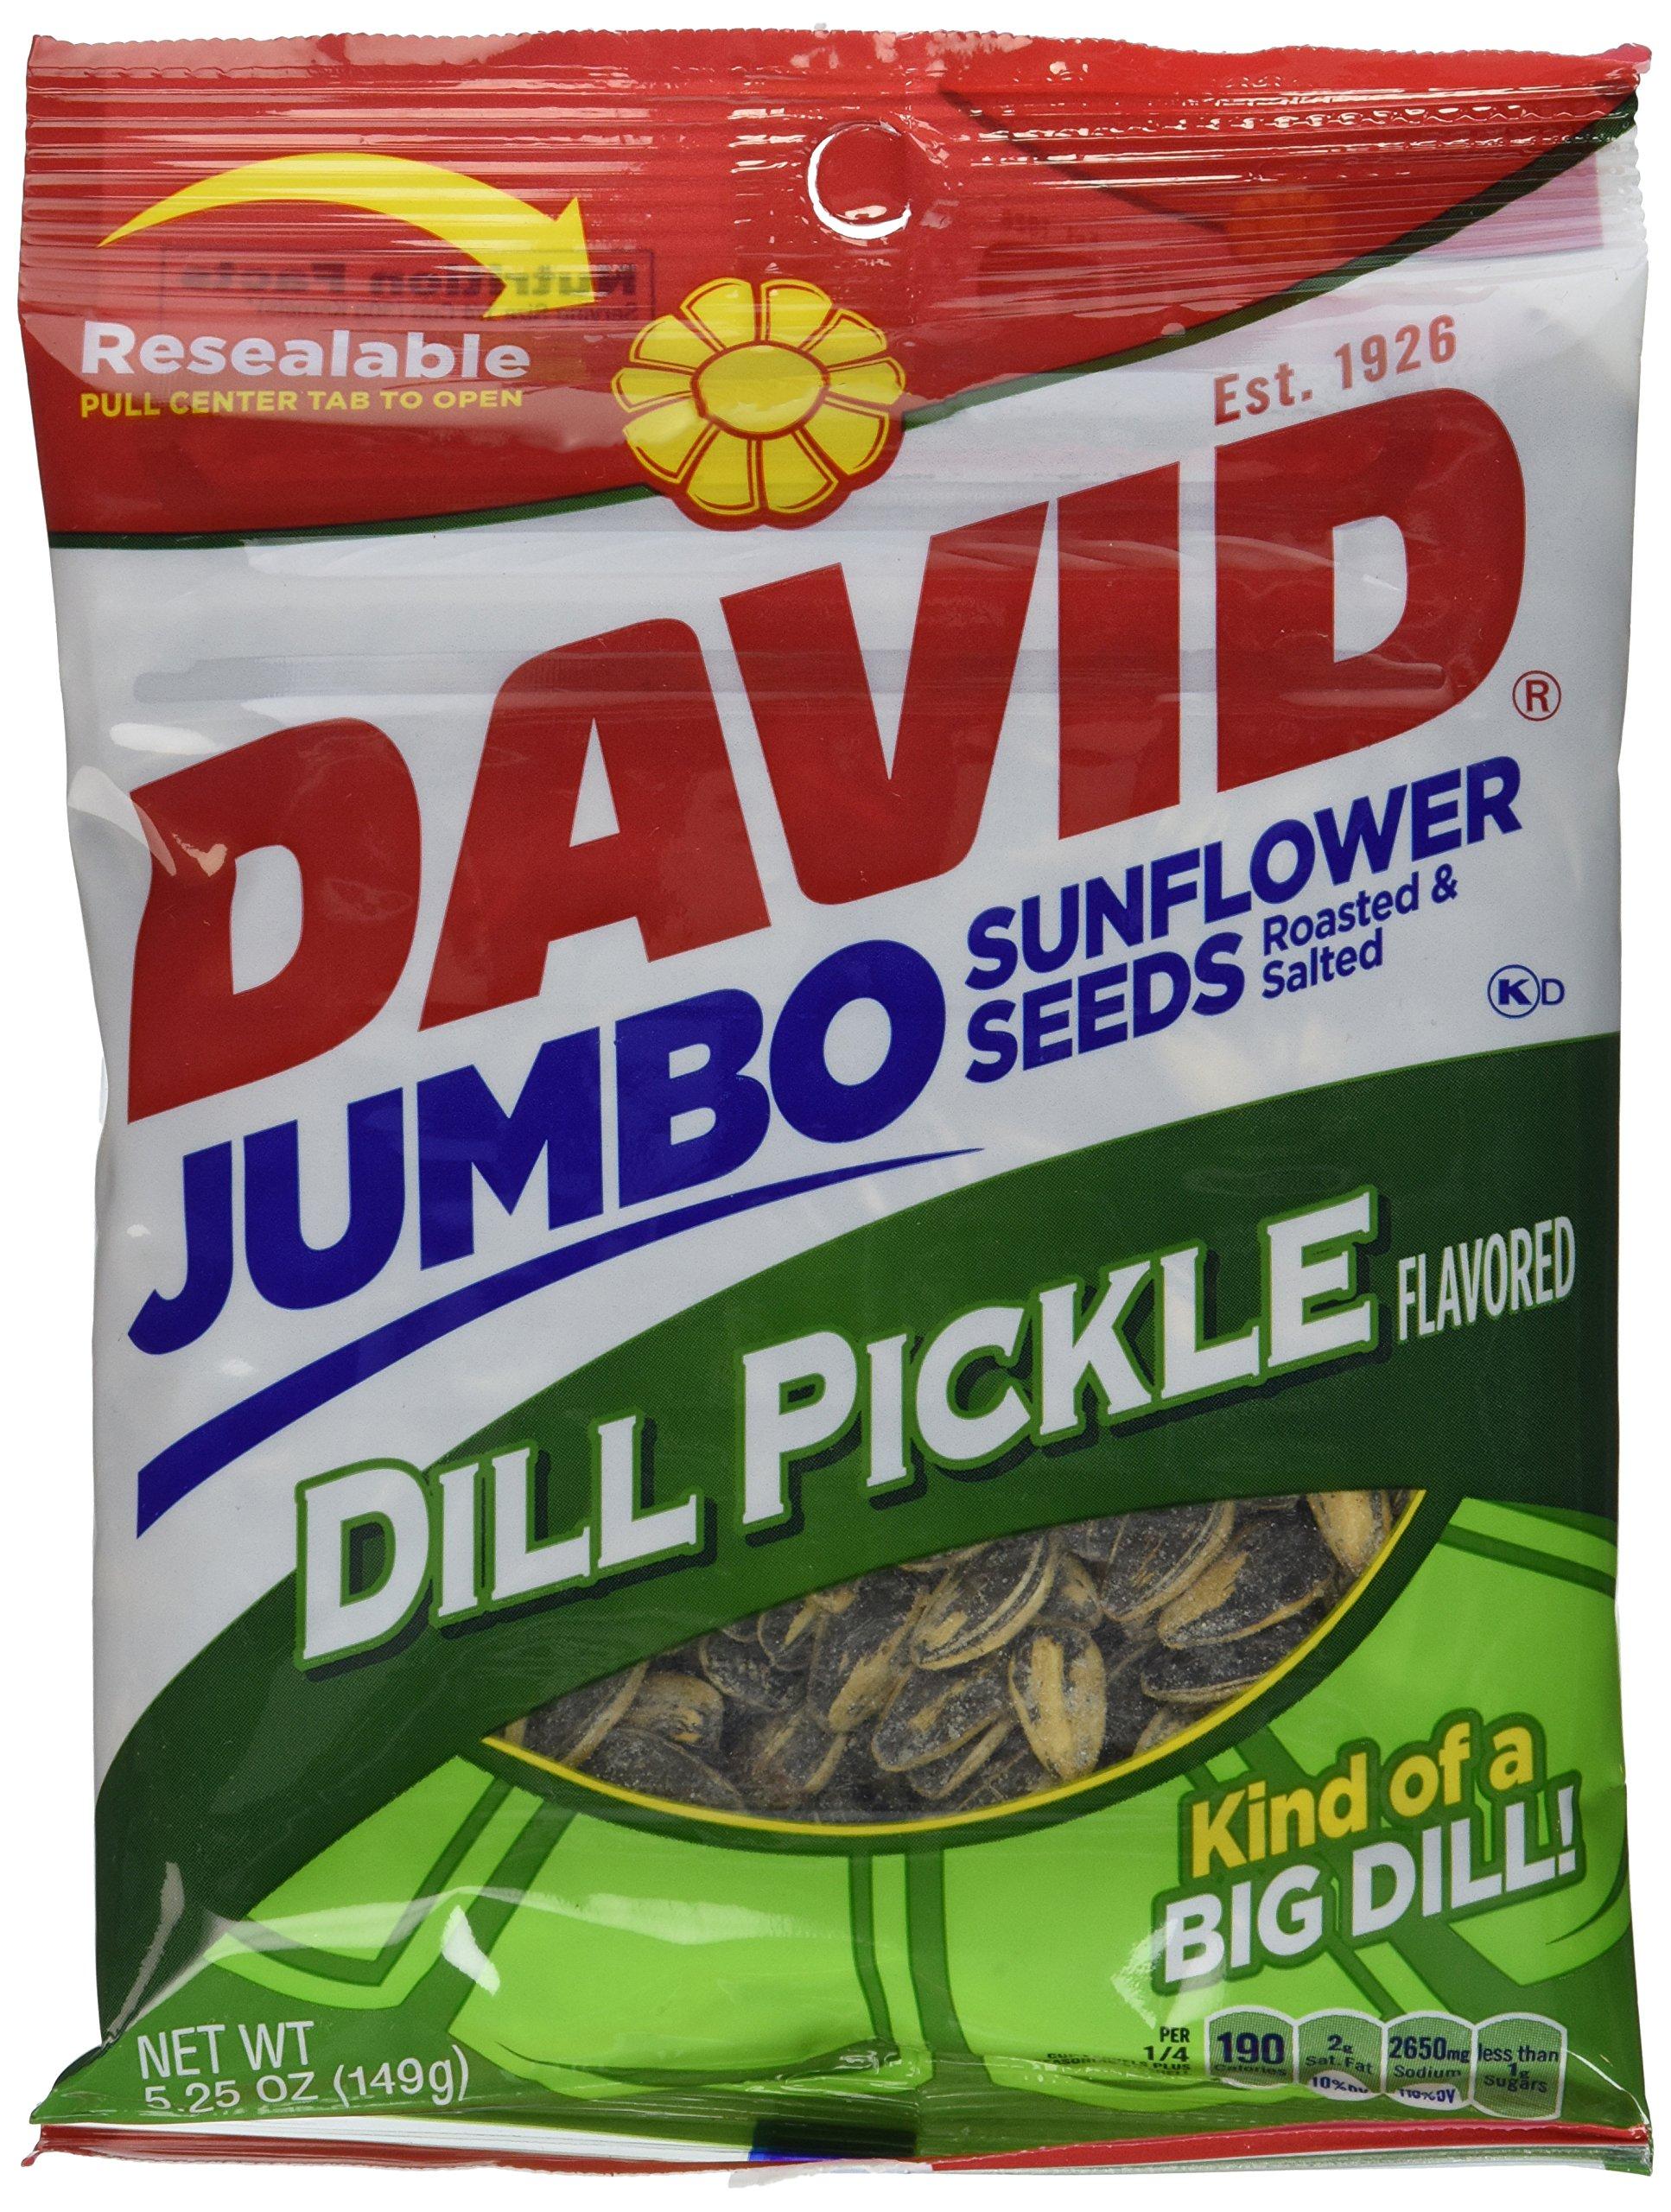 Conagra David Dill Pickle Sunflower Seed, 5.25 Ounce -- 12 per case.